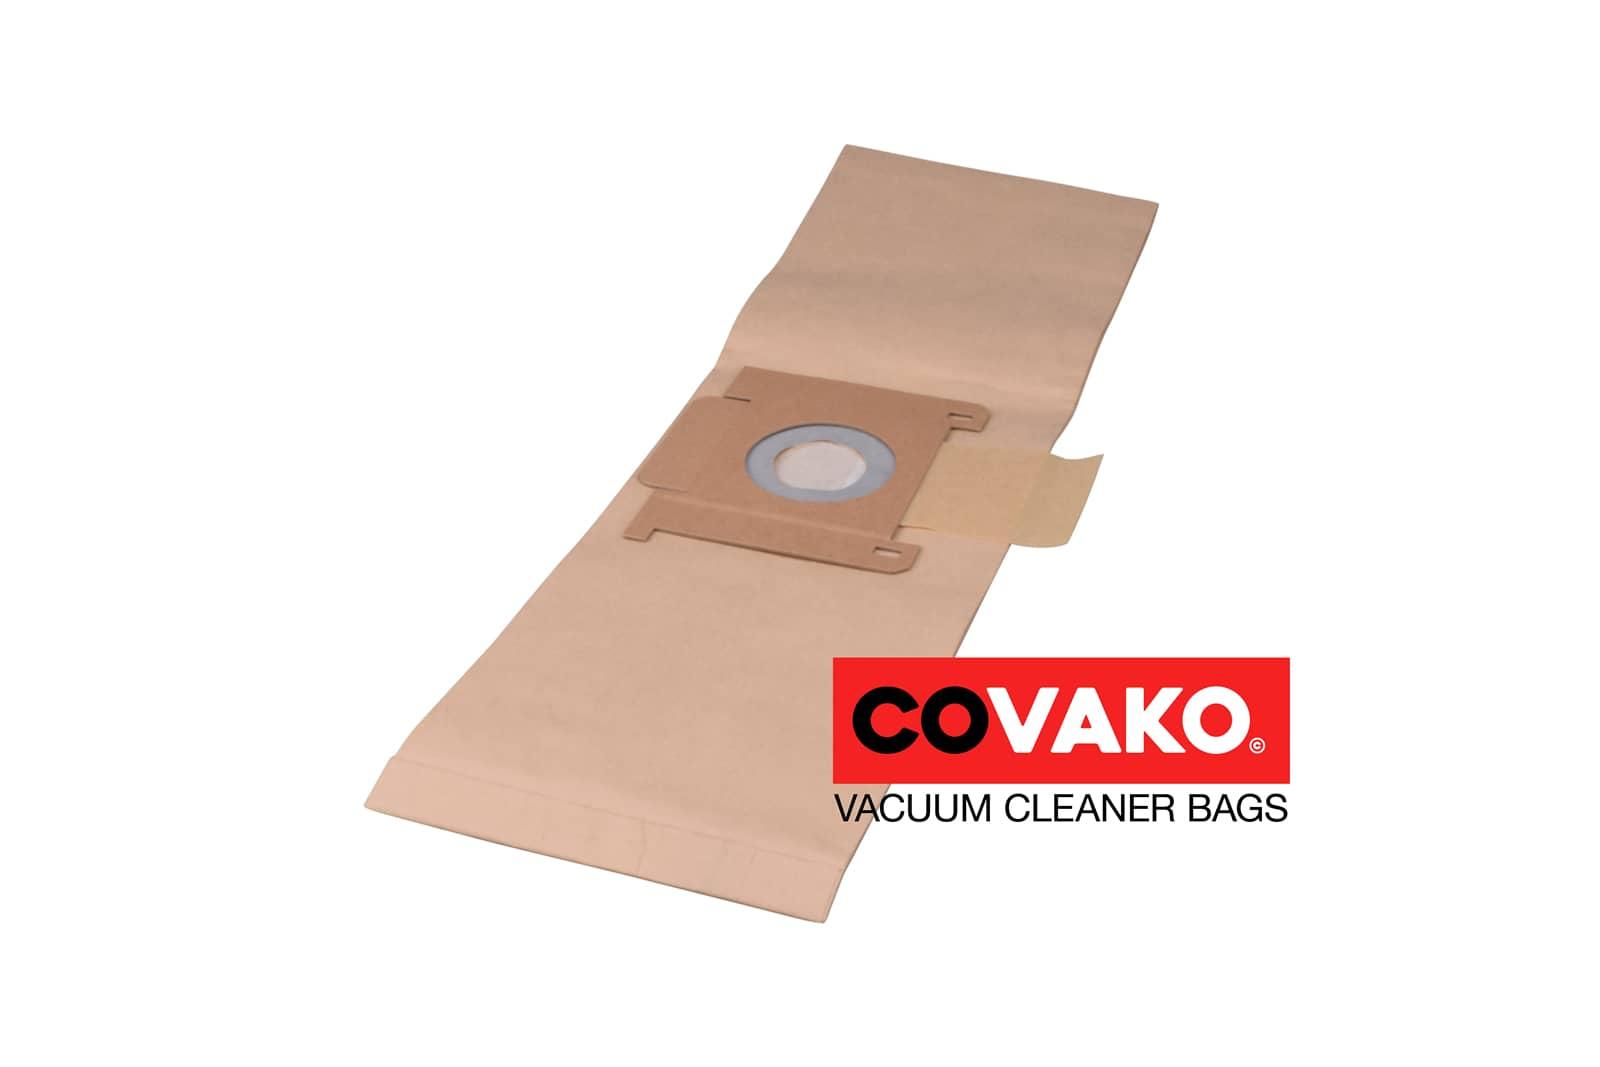 I-vac pur Q / Paper - I-vac vacuum cleaner bags